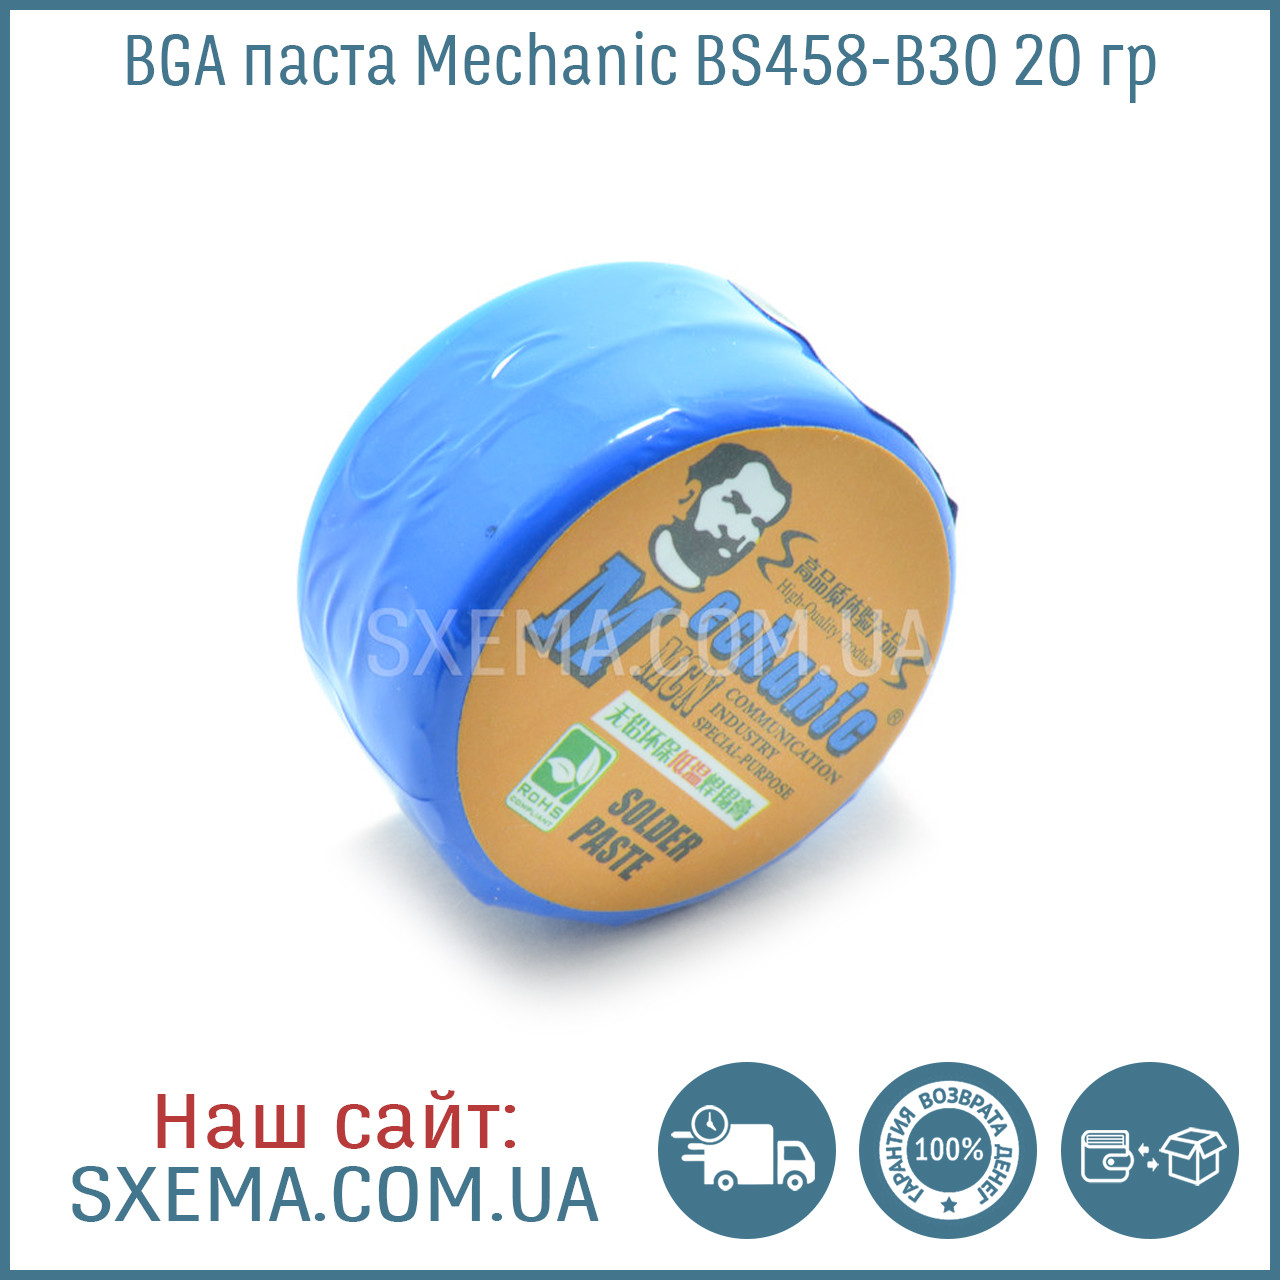 BGA паста легкоплавкая Mechanic BS458-B30 20 гр, Sn 42%, Bi 58%